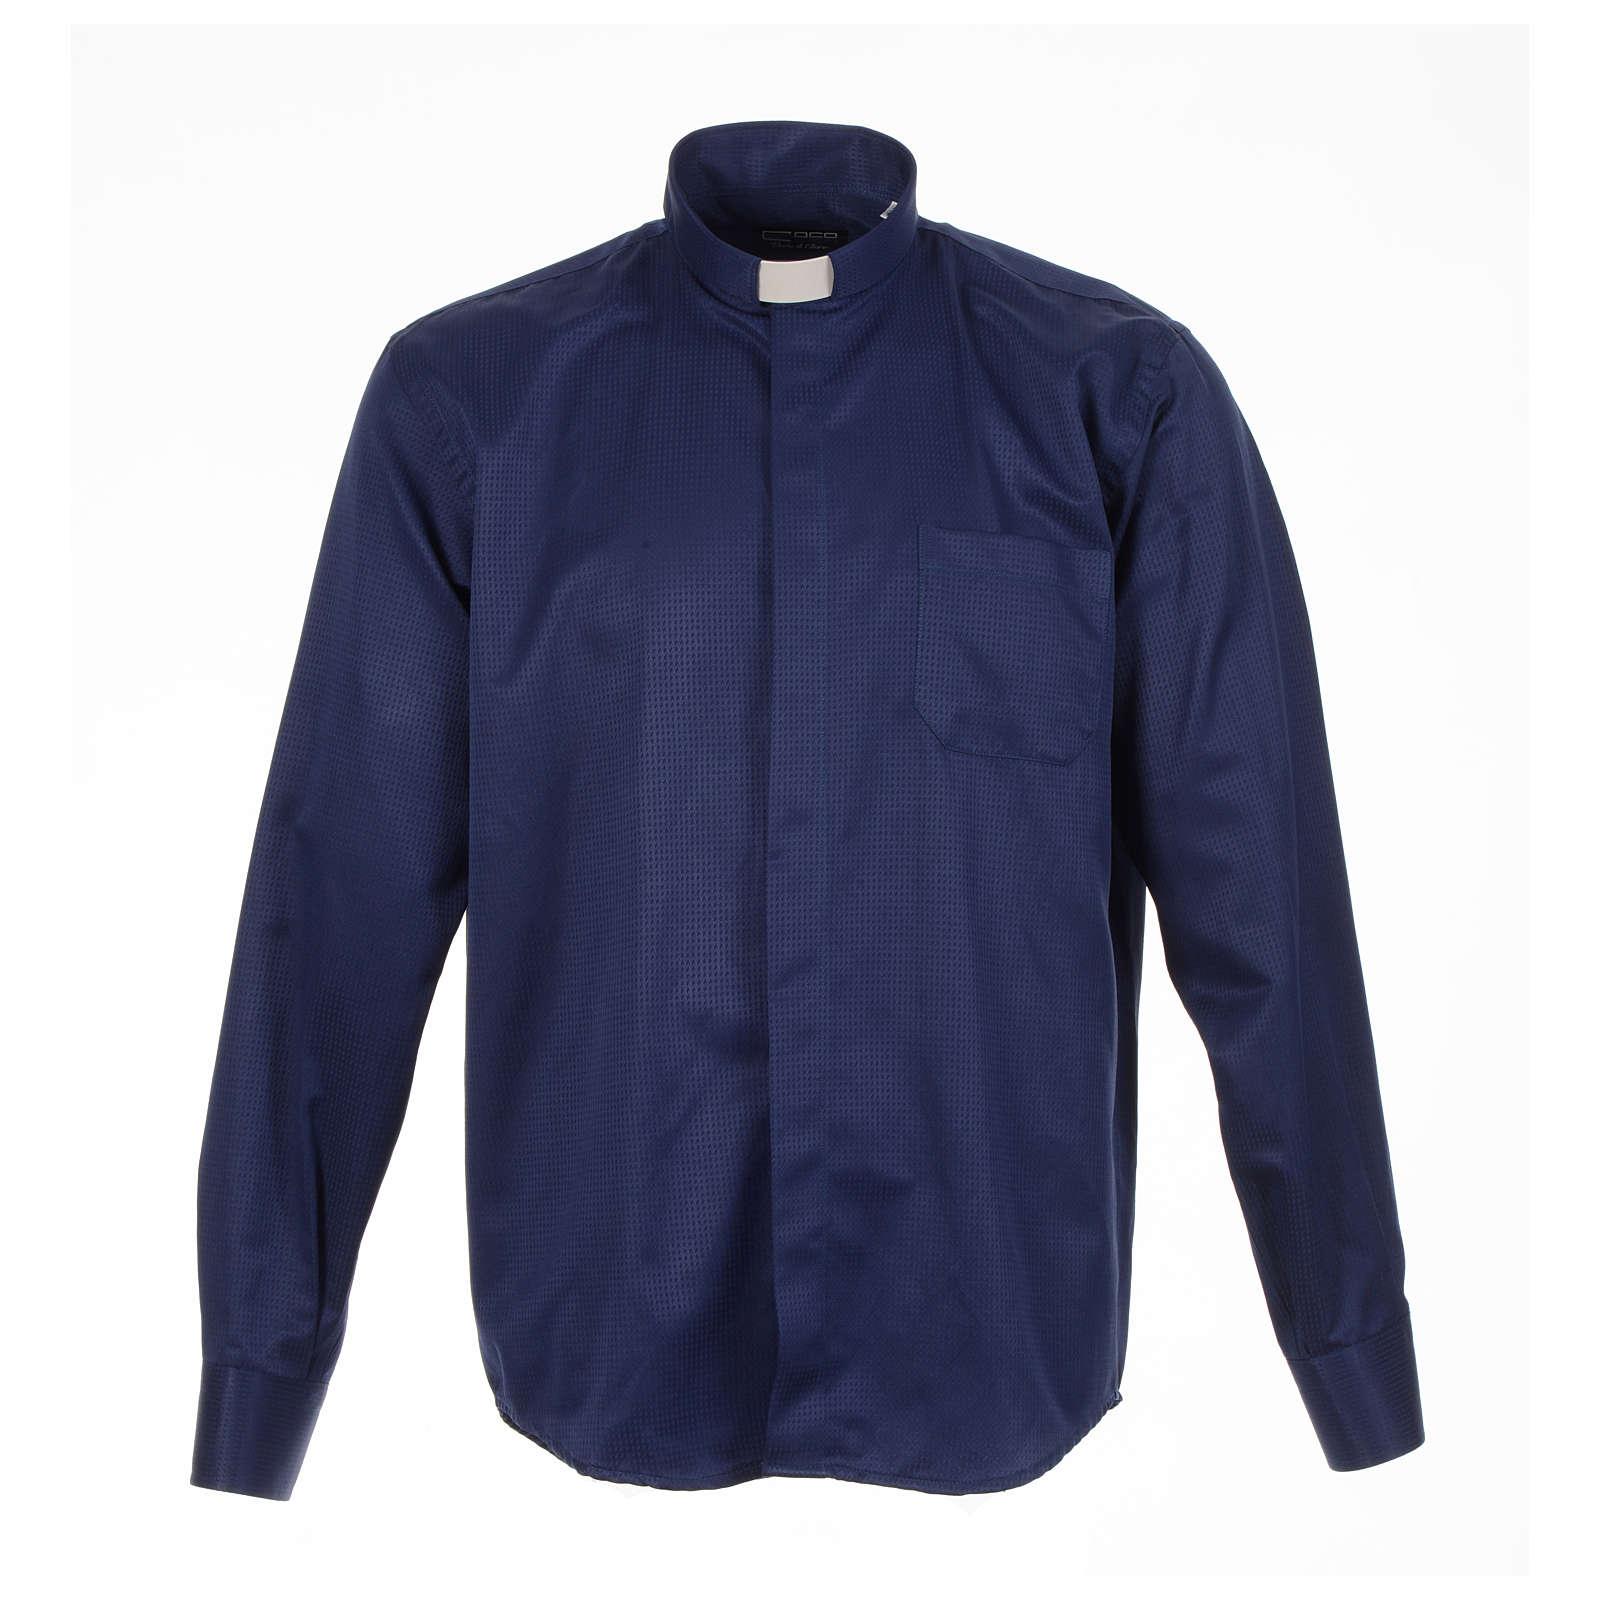 Camisa sacerdote jacquard azul escuro manga longa 4